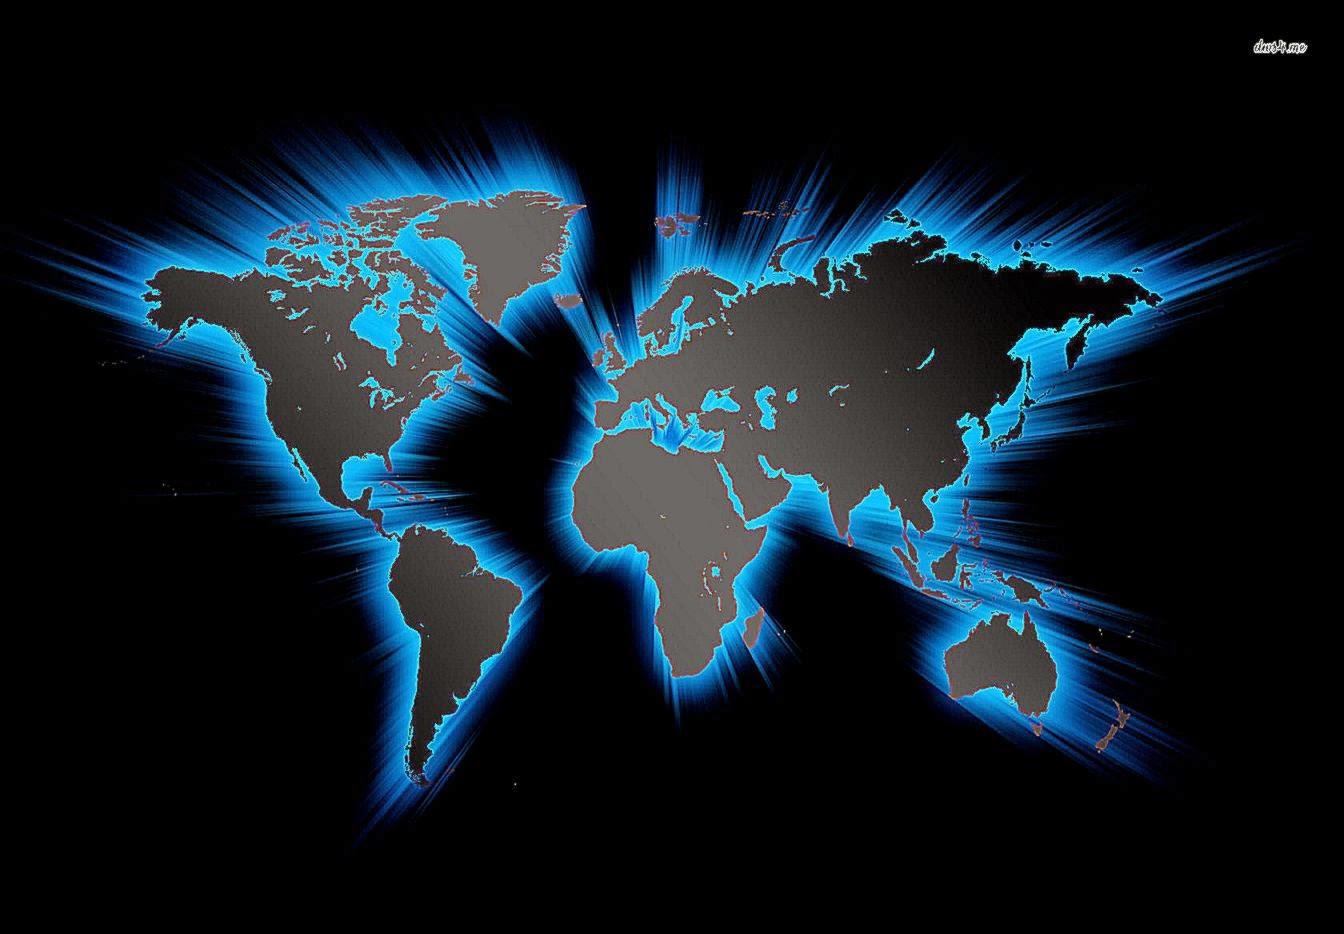 Creative digital art 3d world map globe wallpaper wallpaper download sciox Choice Image